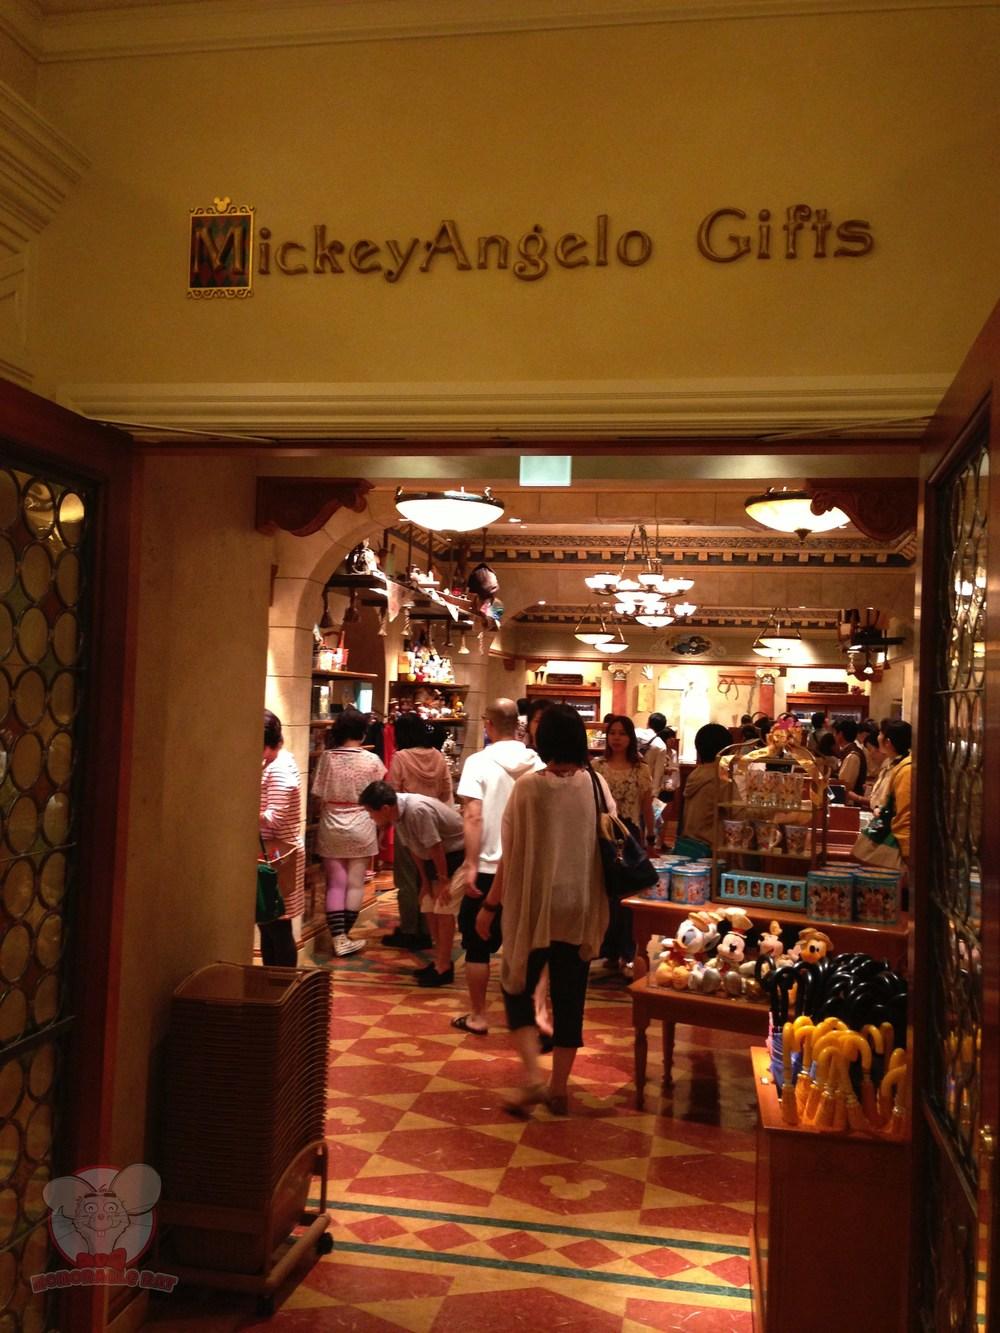 MickeyAngelo Gifts